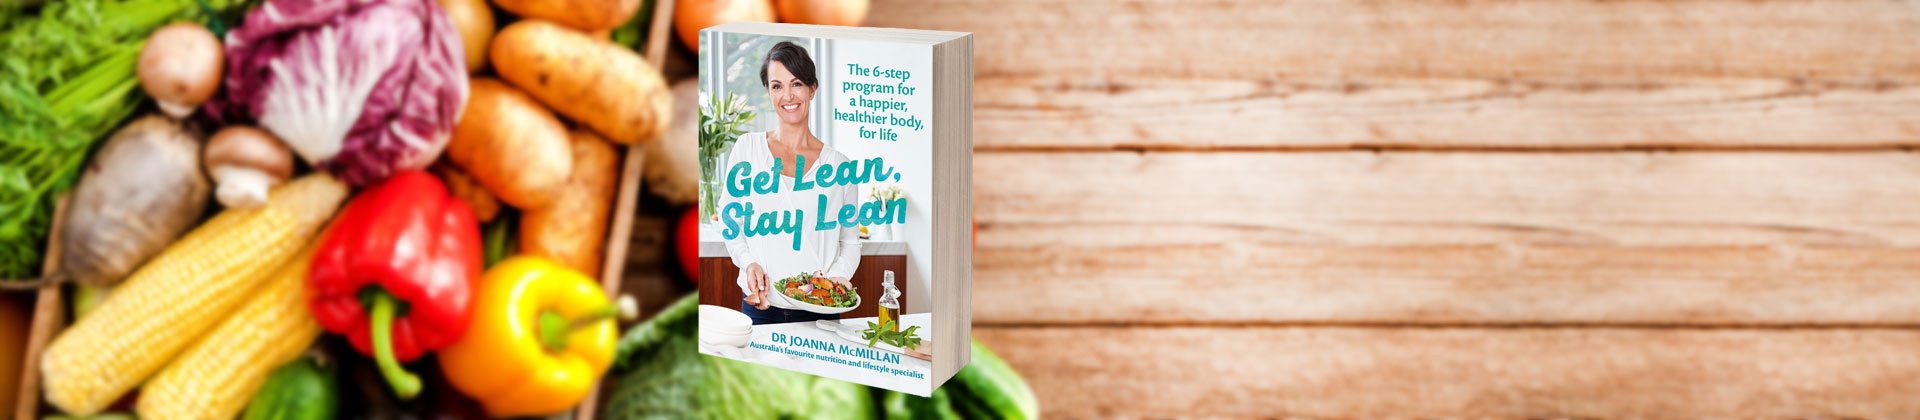 Get Lean, Stay Lean